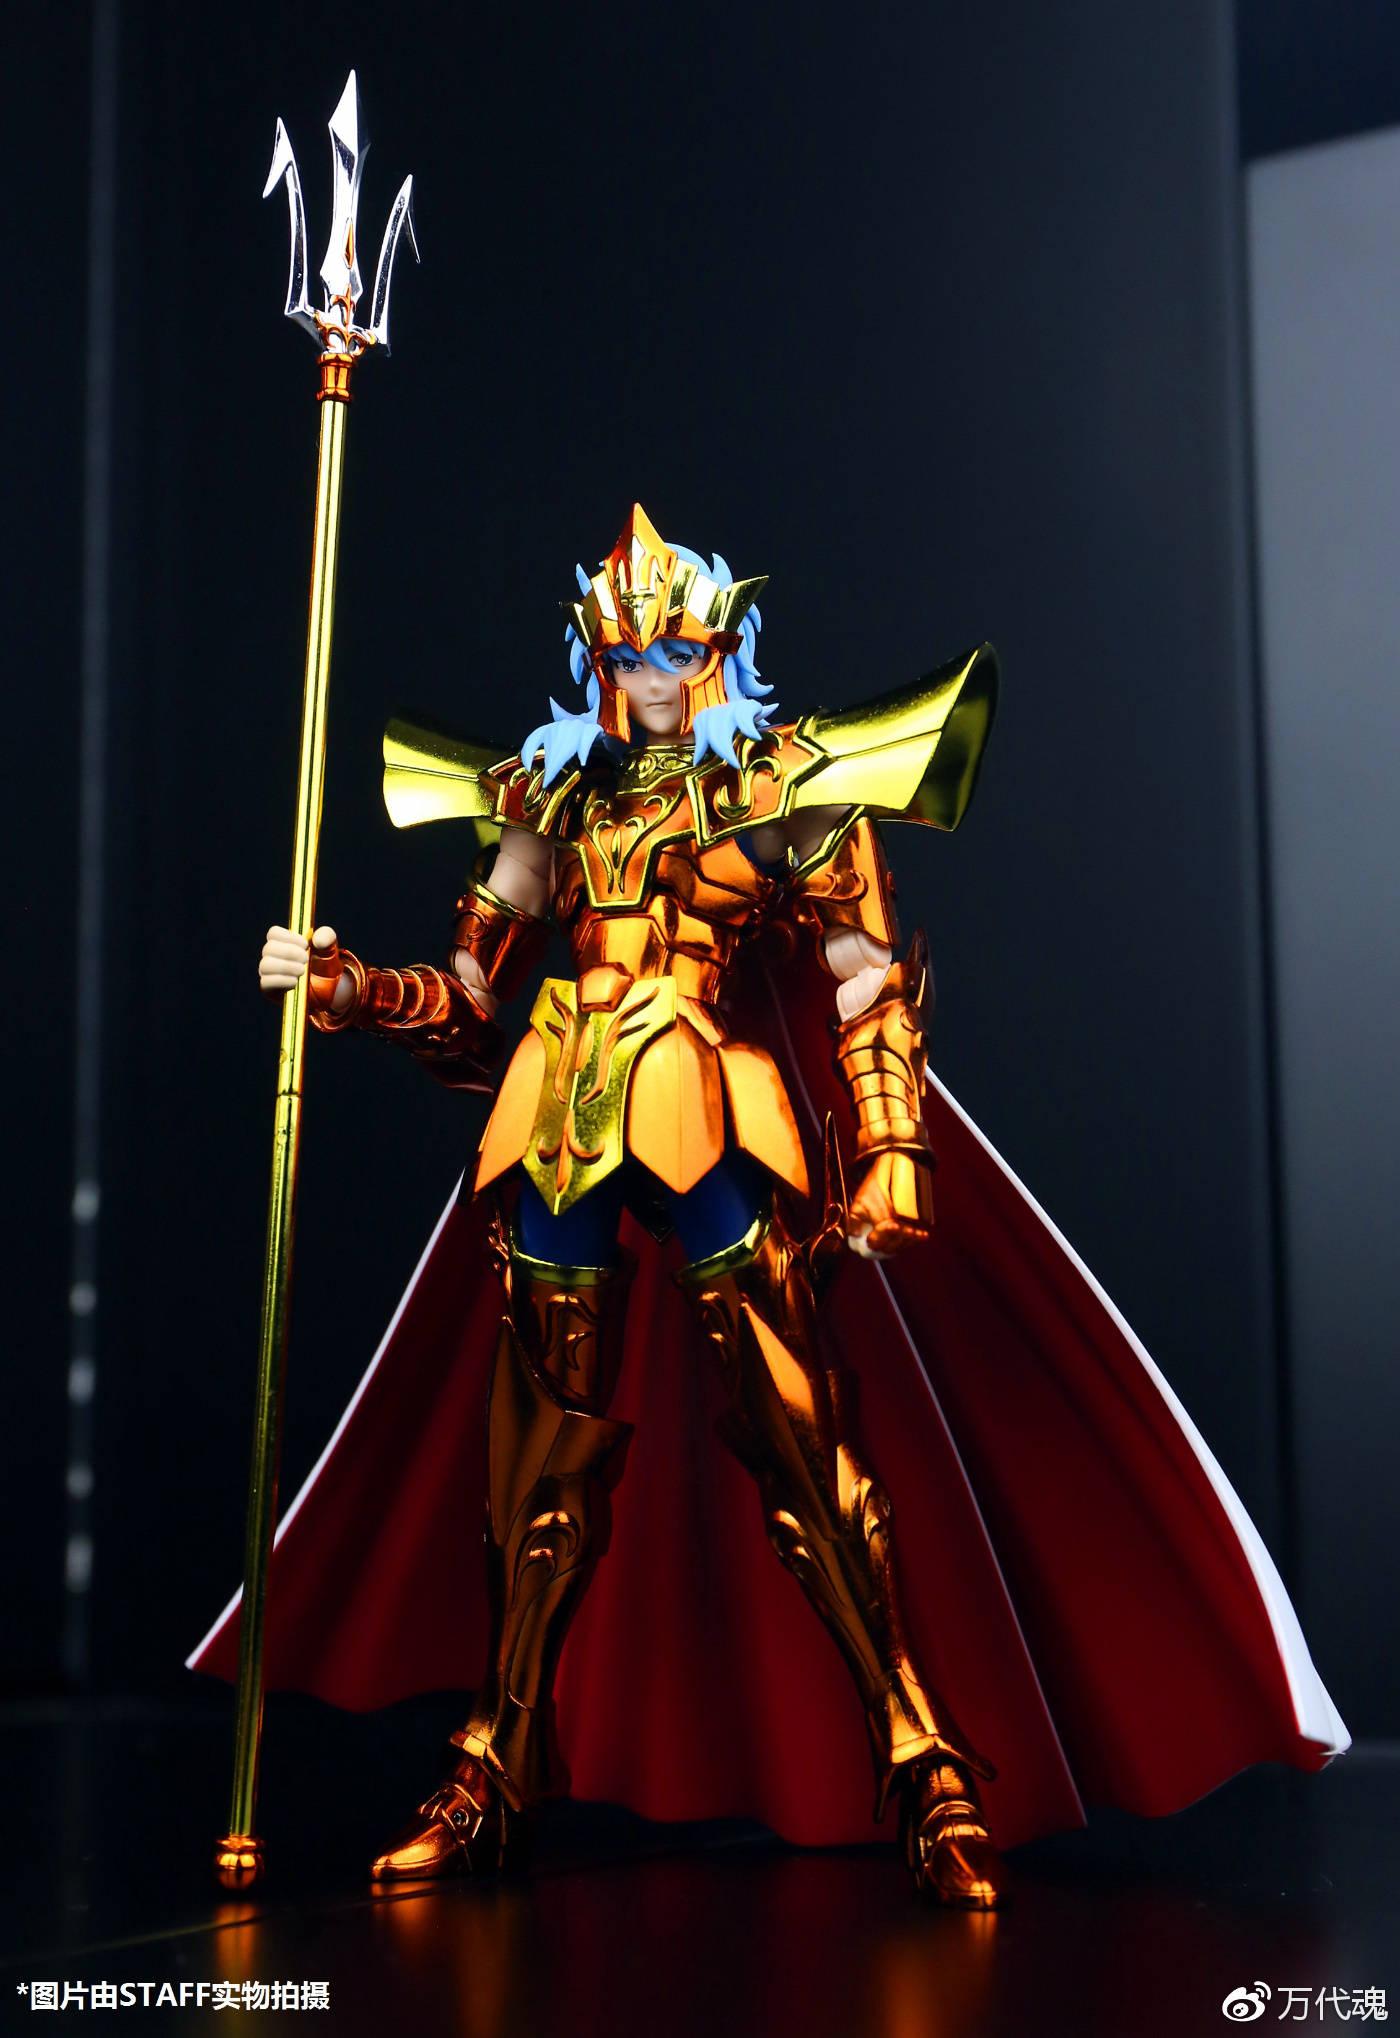 [Imagens] Poseidon EX & Poseidon EX Imperial Throne Set Ykjc2y4v_o